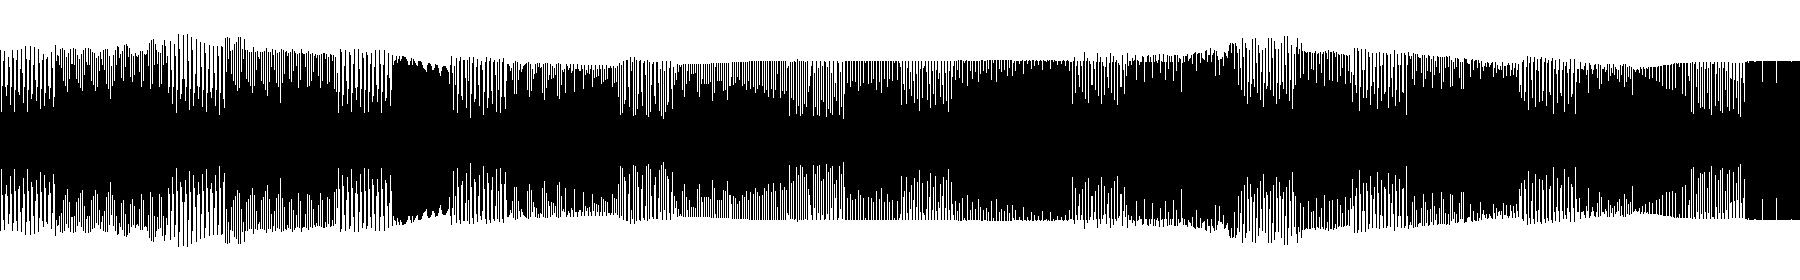 ehp synloop 127 electroanthem a